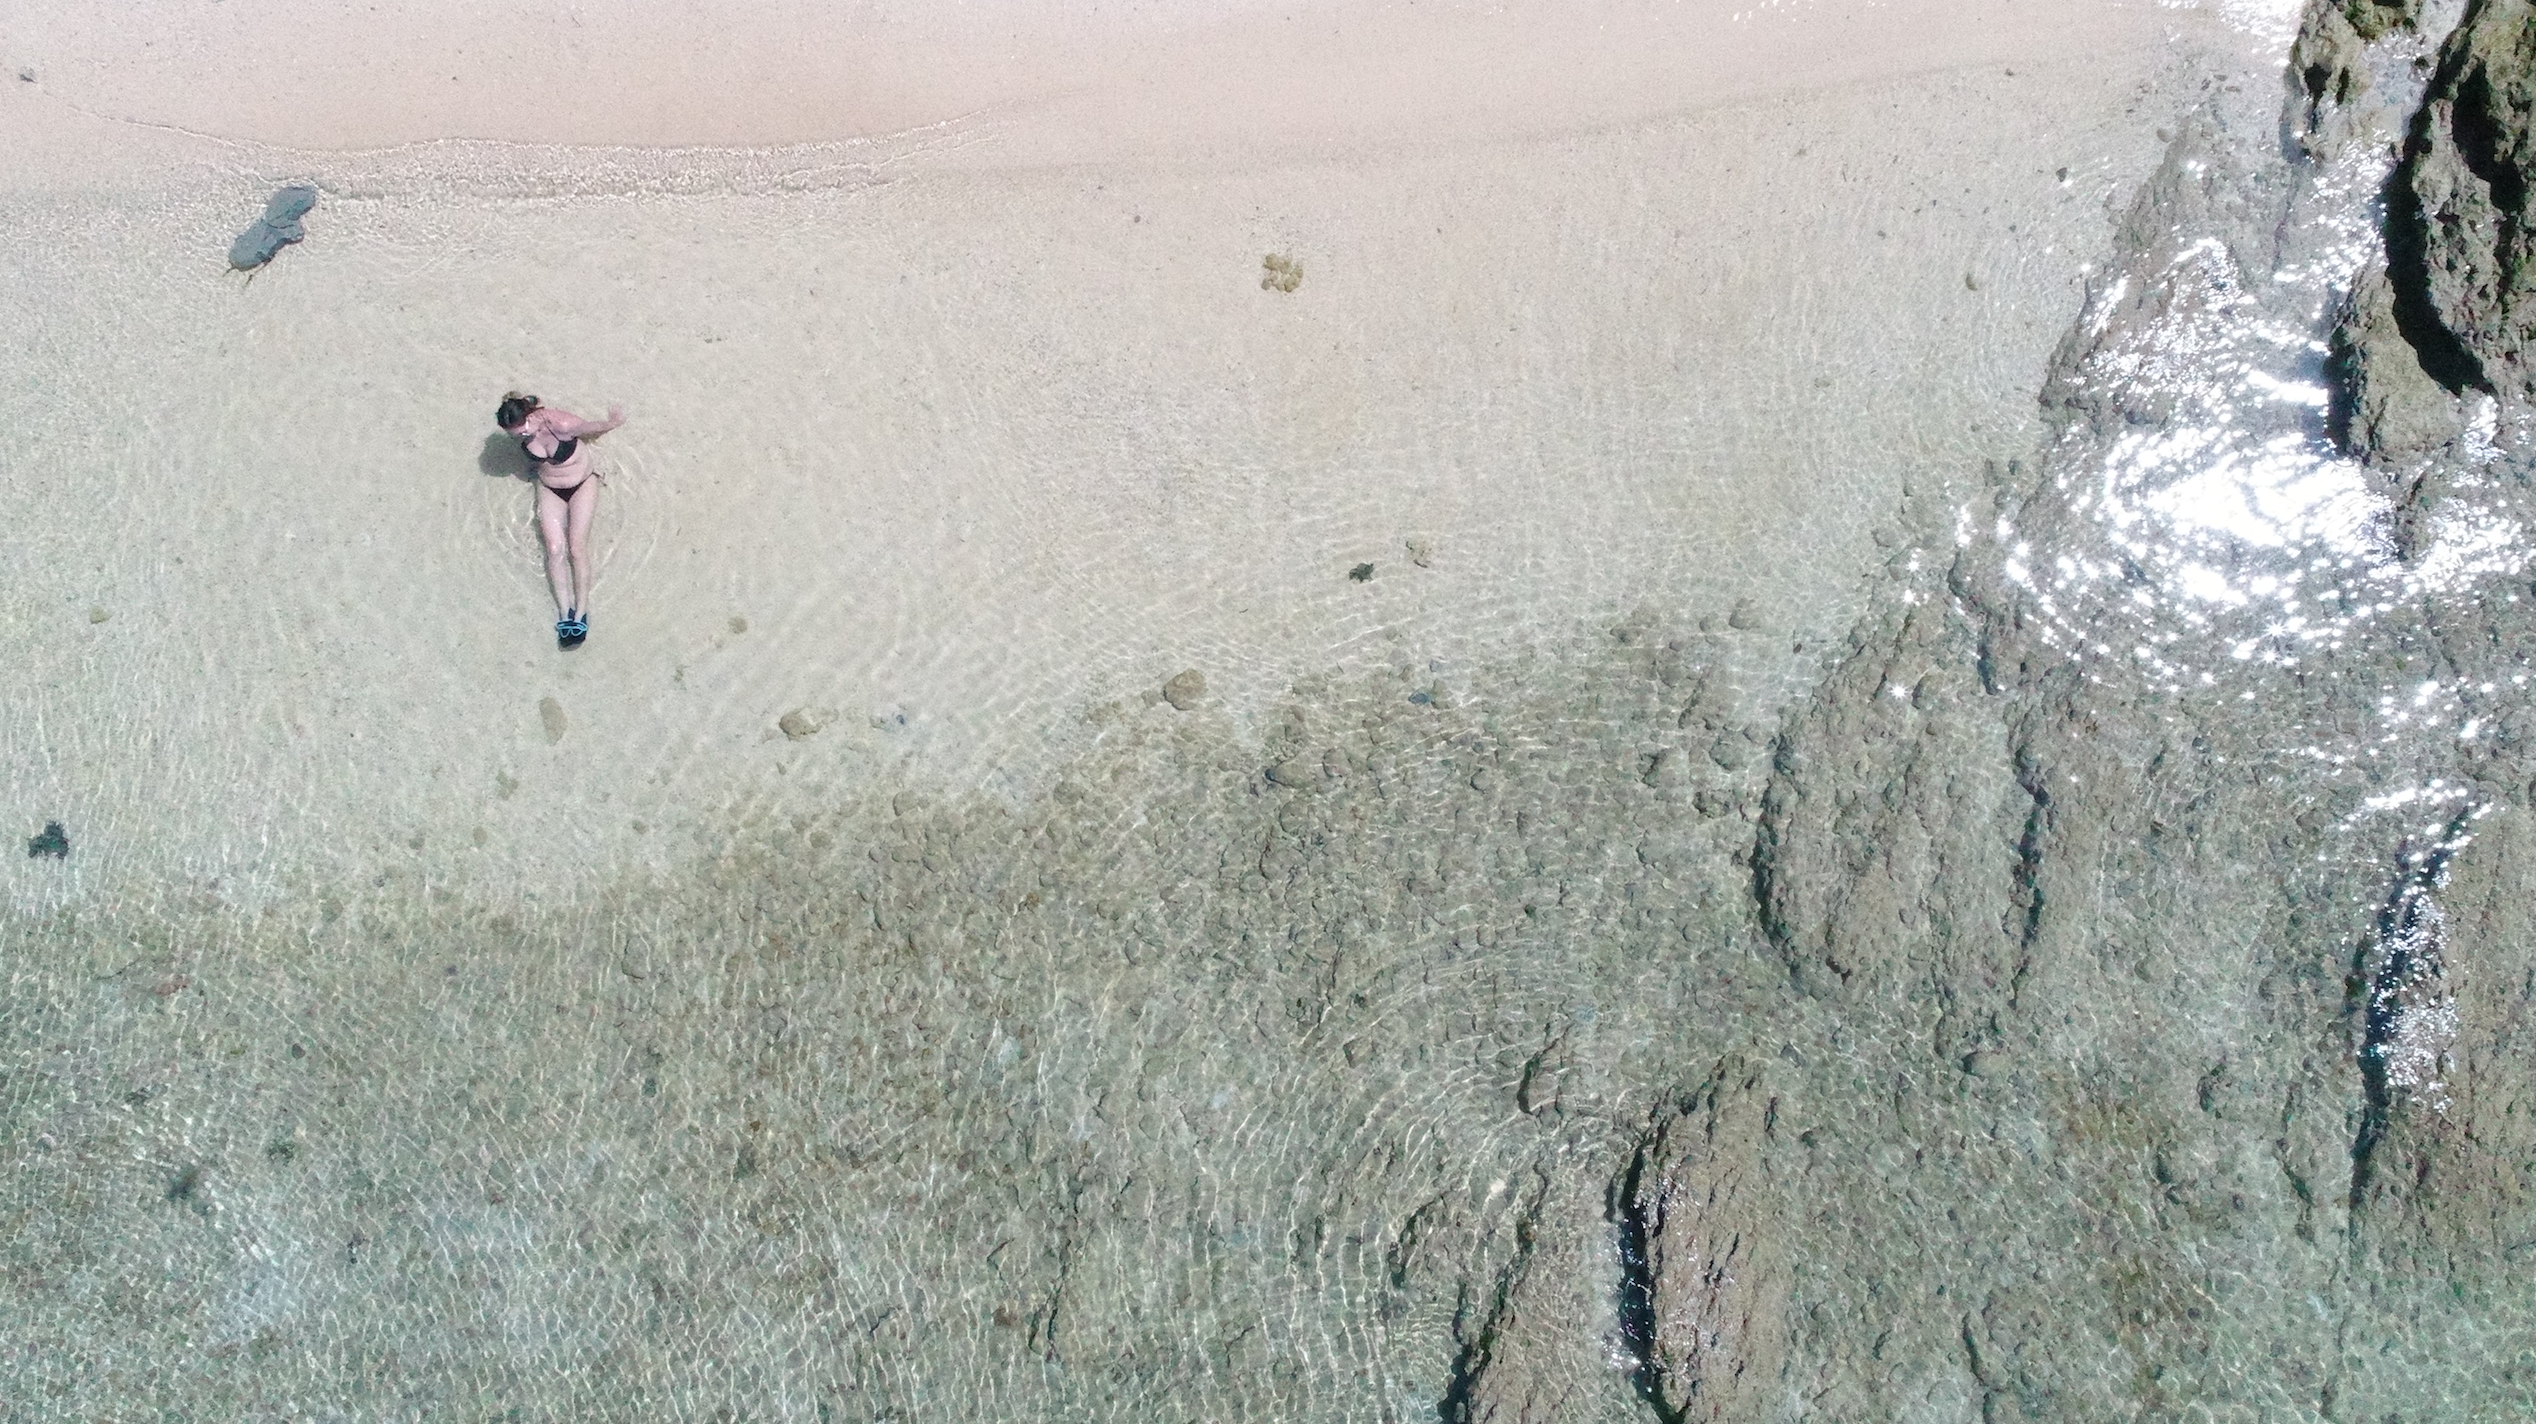 【DRONE WALKER実績】空撮映像まとめてみました。